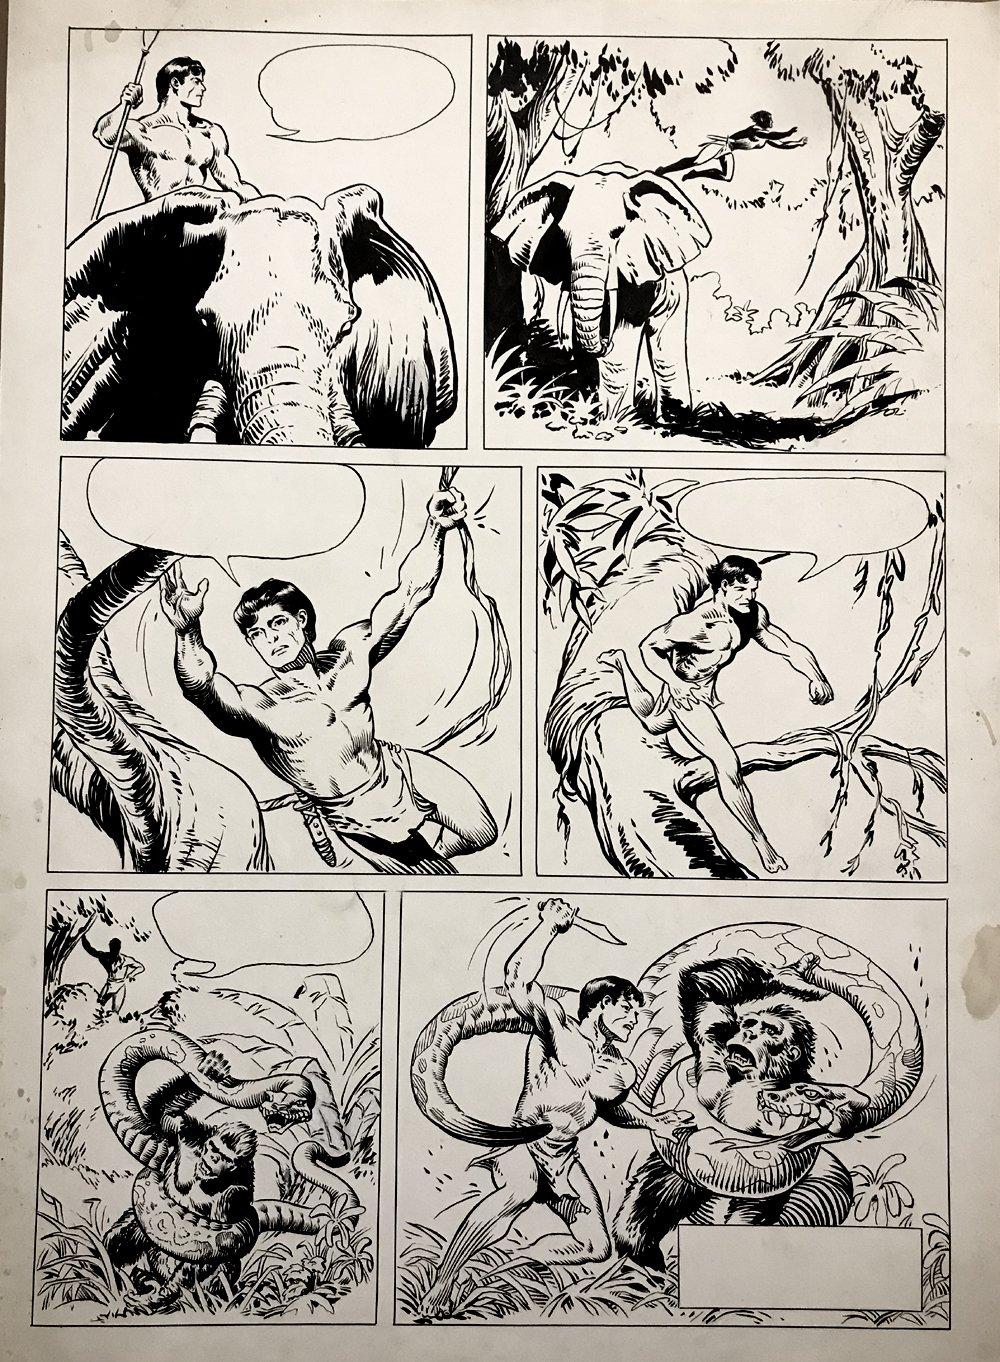 TARZAN Battles Giant Snake, Very Large Study On Huge Board! (Early 1950s)